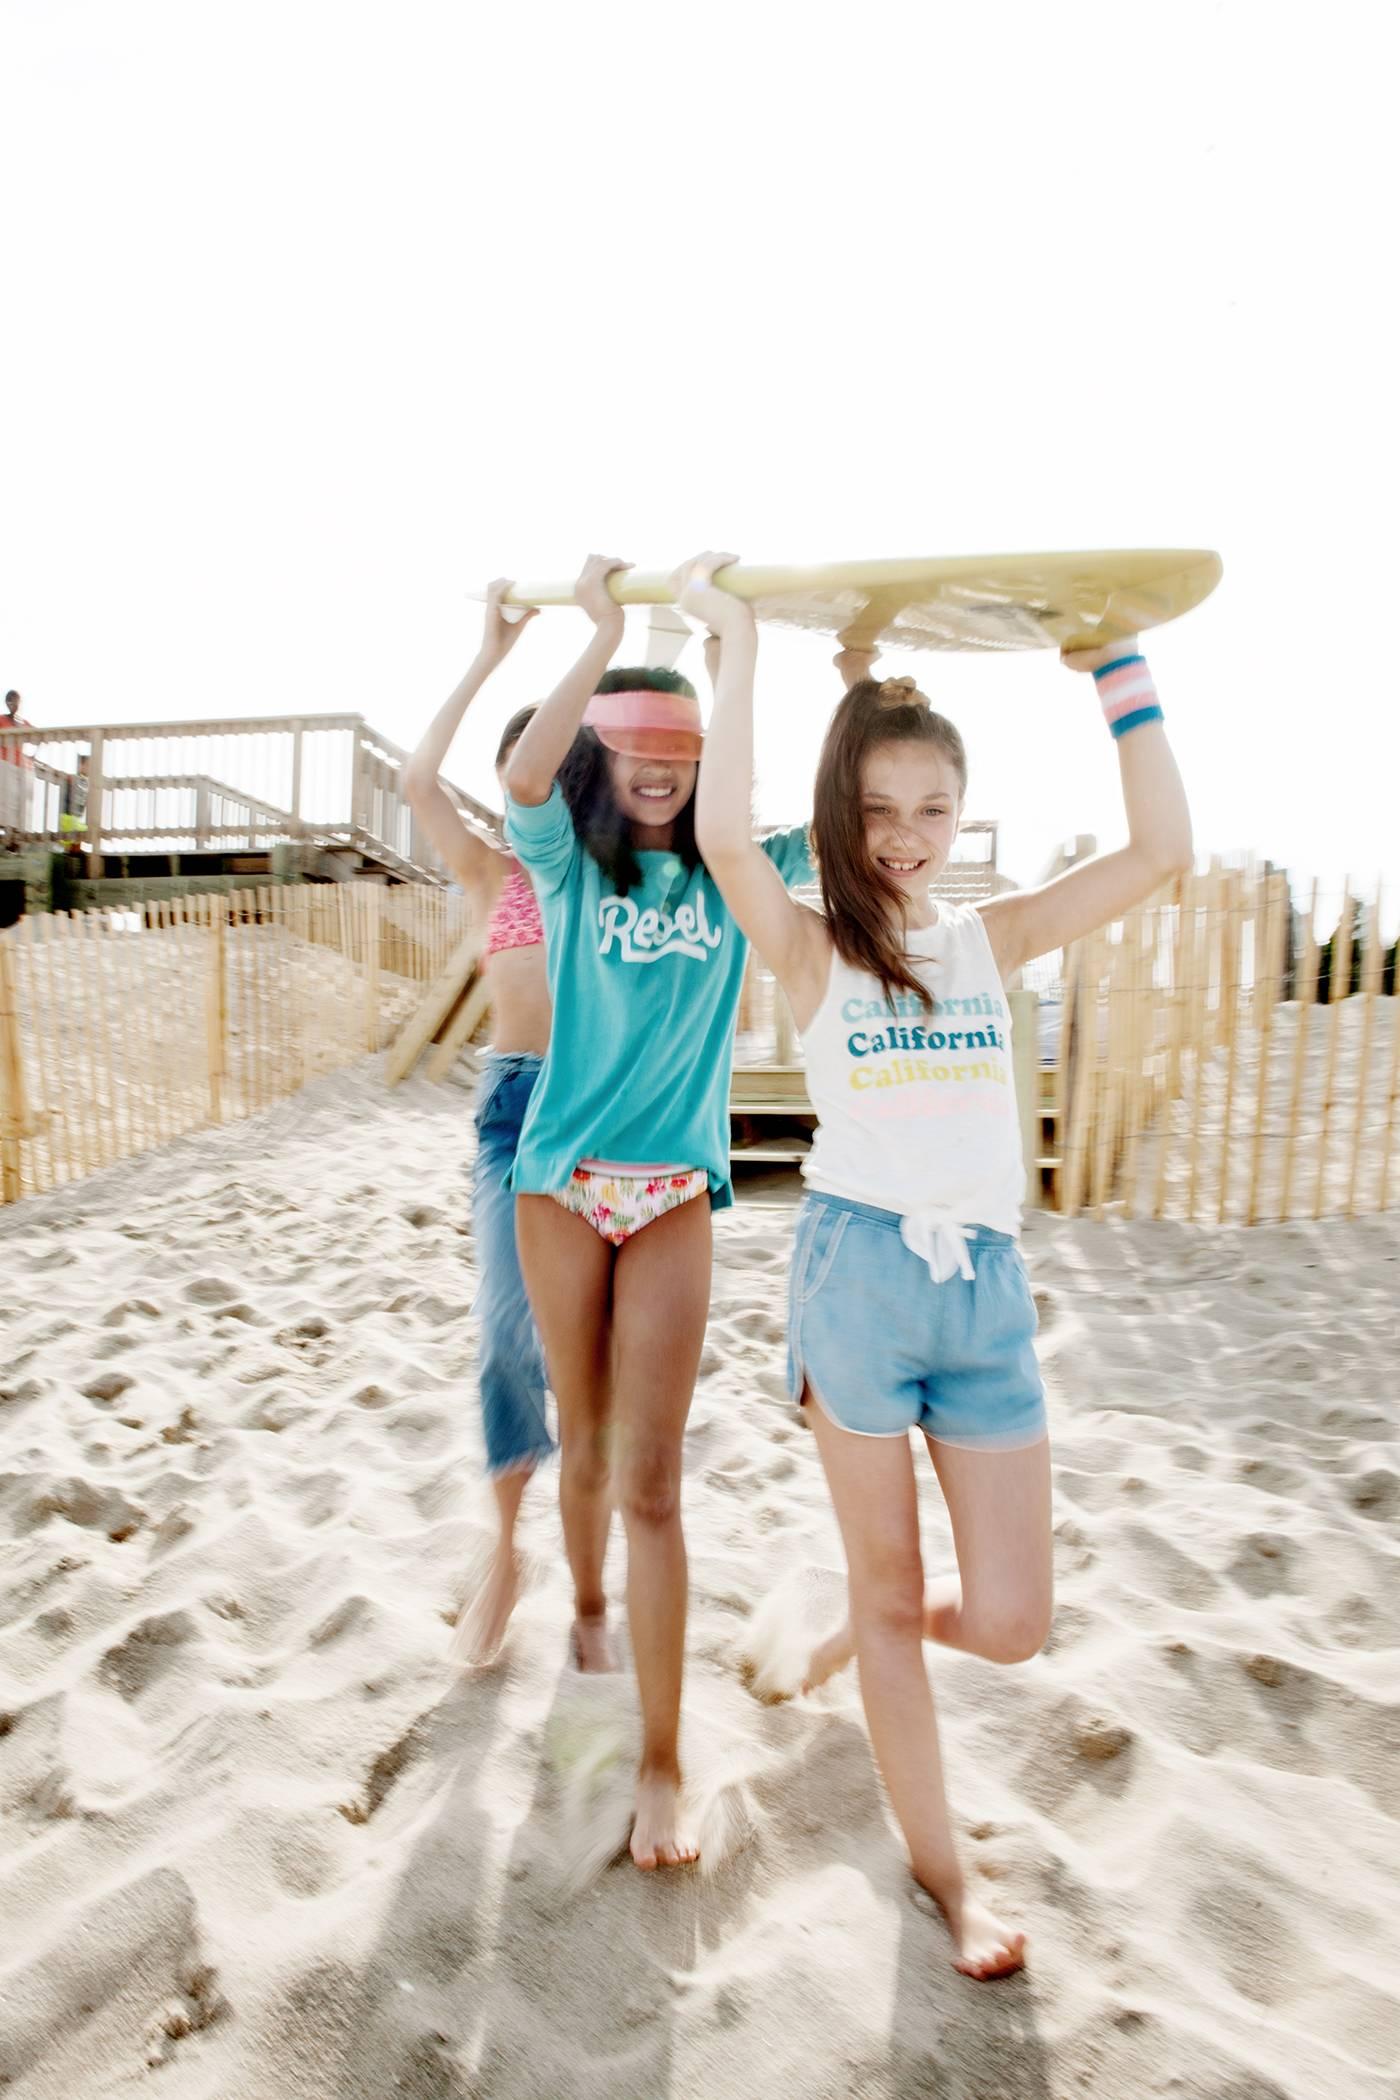 ZB_20170629_beach_round2_210012b.jpg